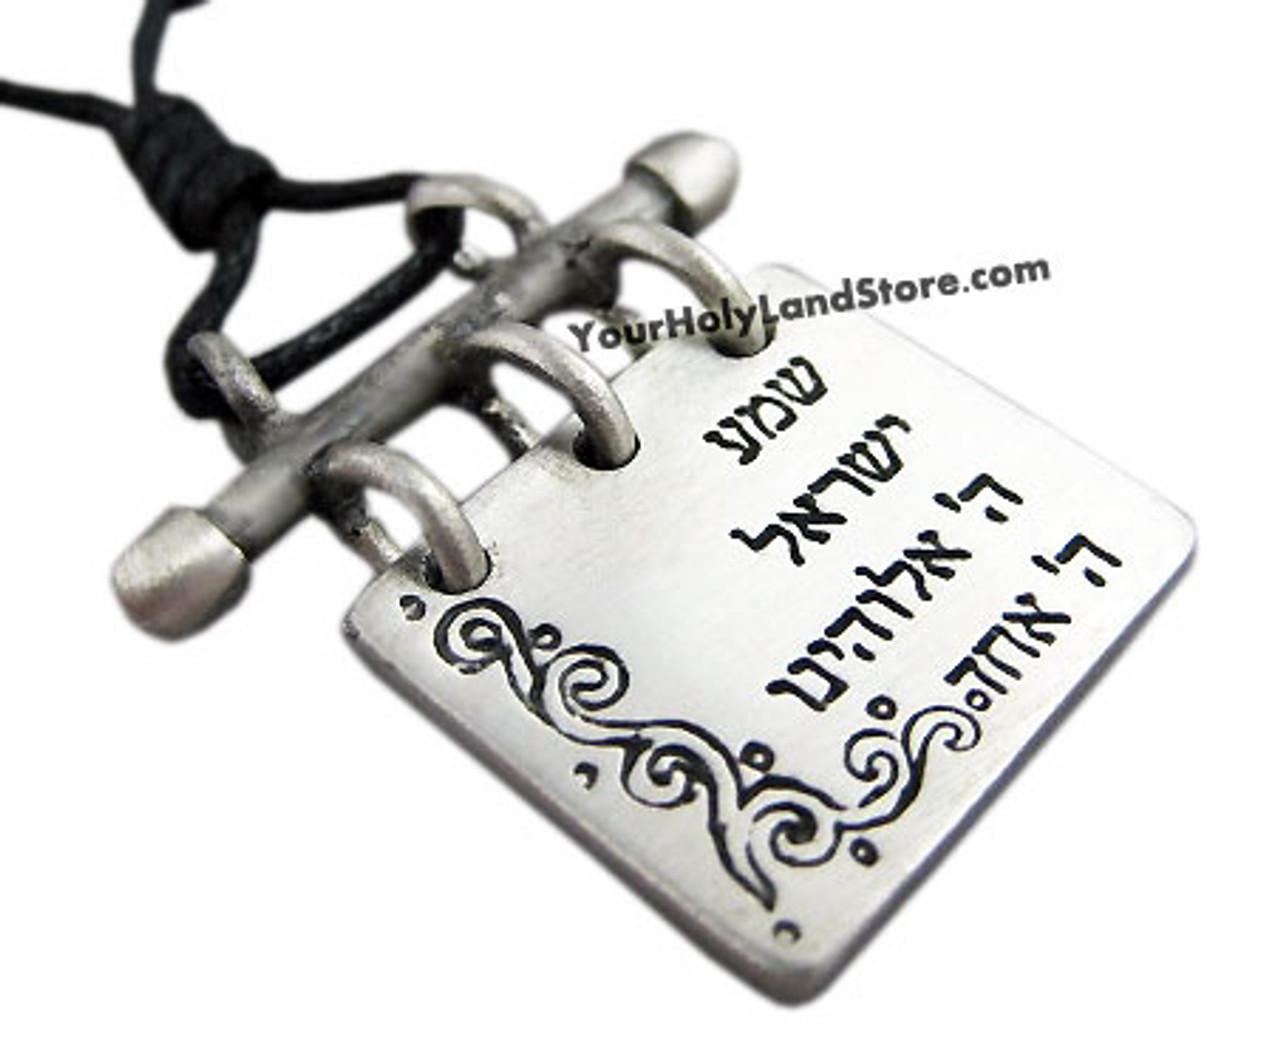 JEWISH SHEMA ISRAEL PRAYER NECKLACE